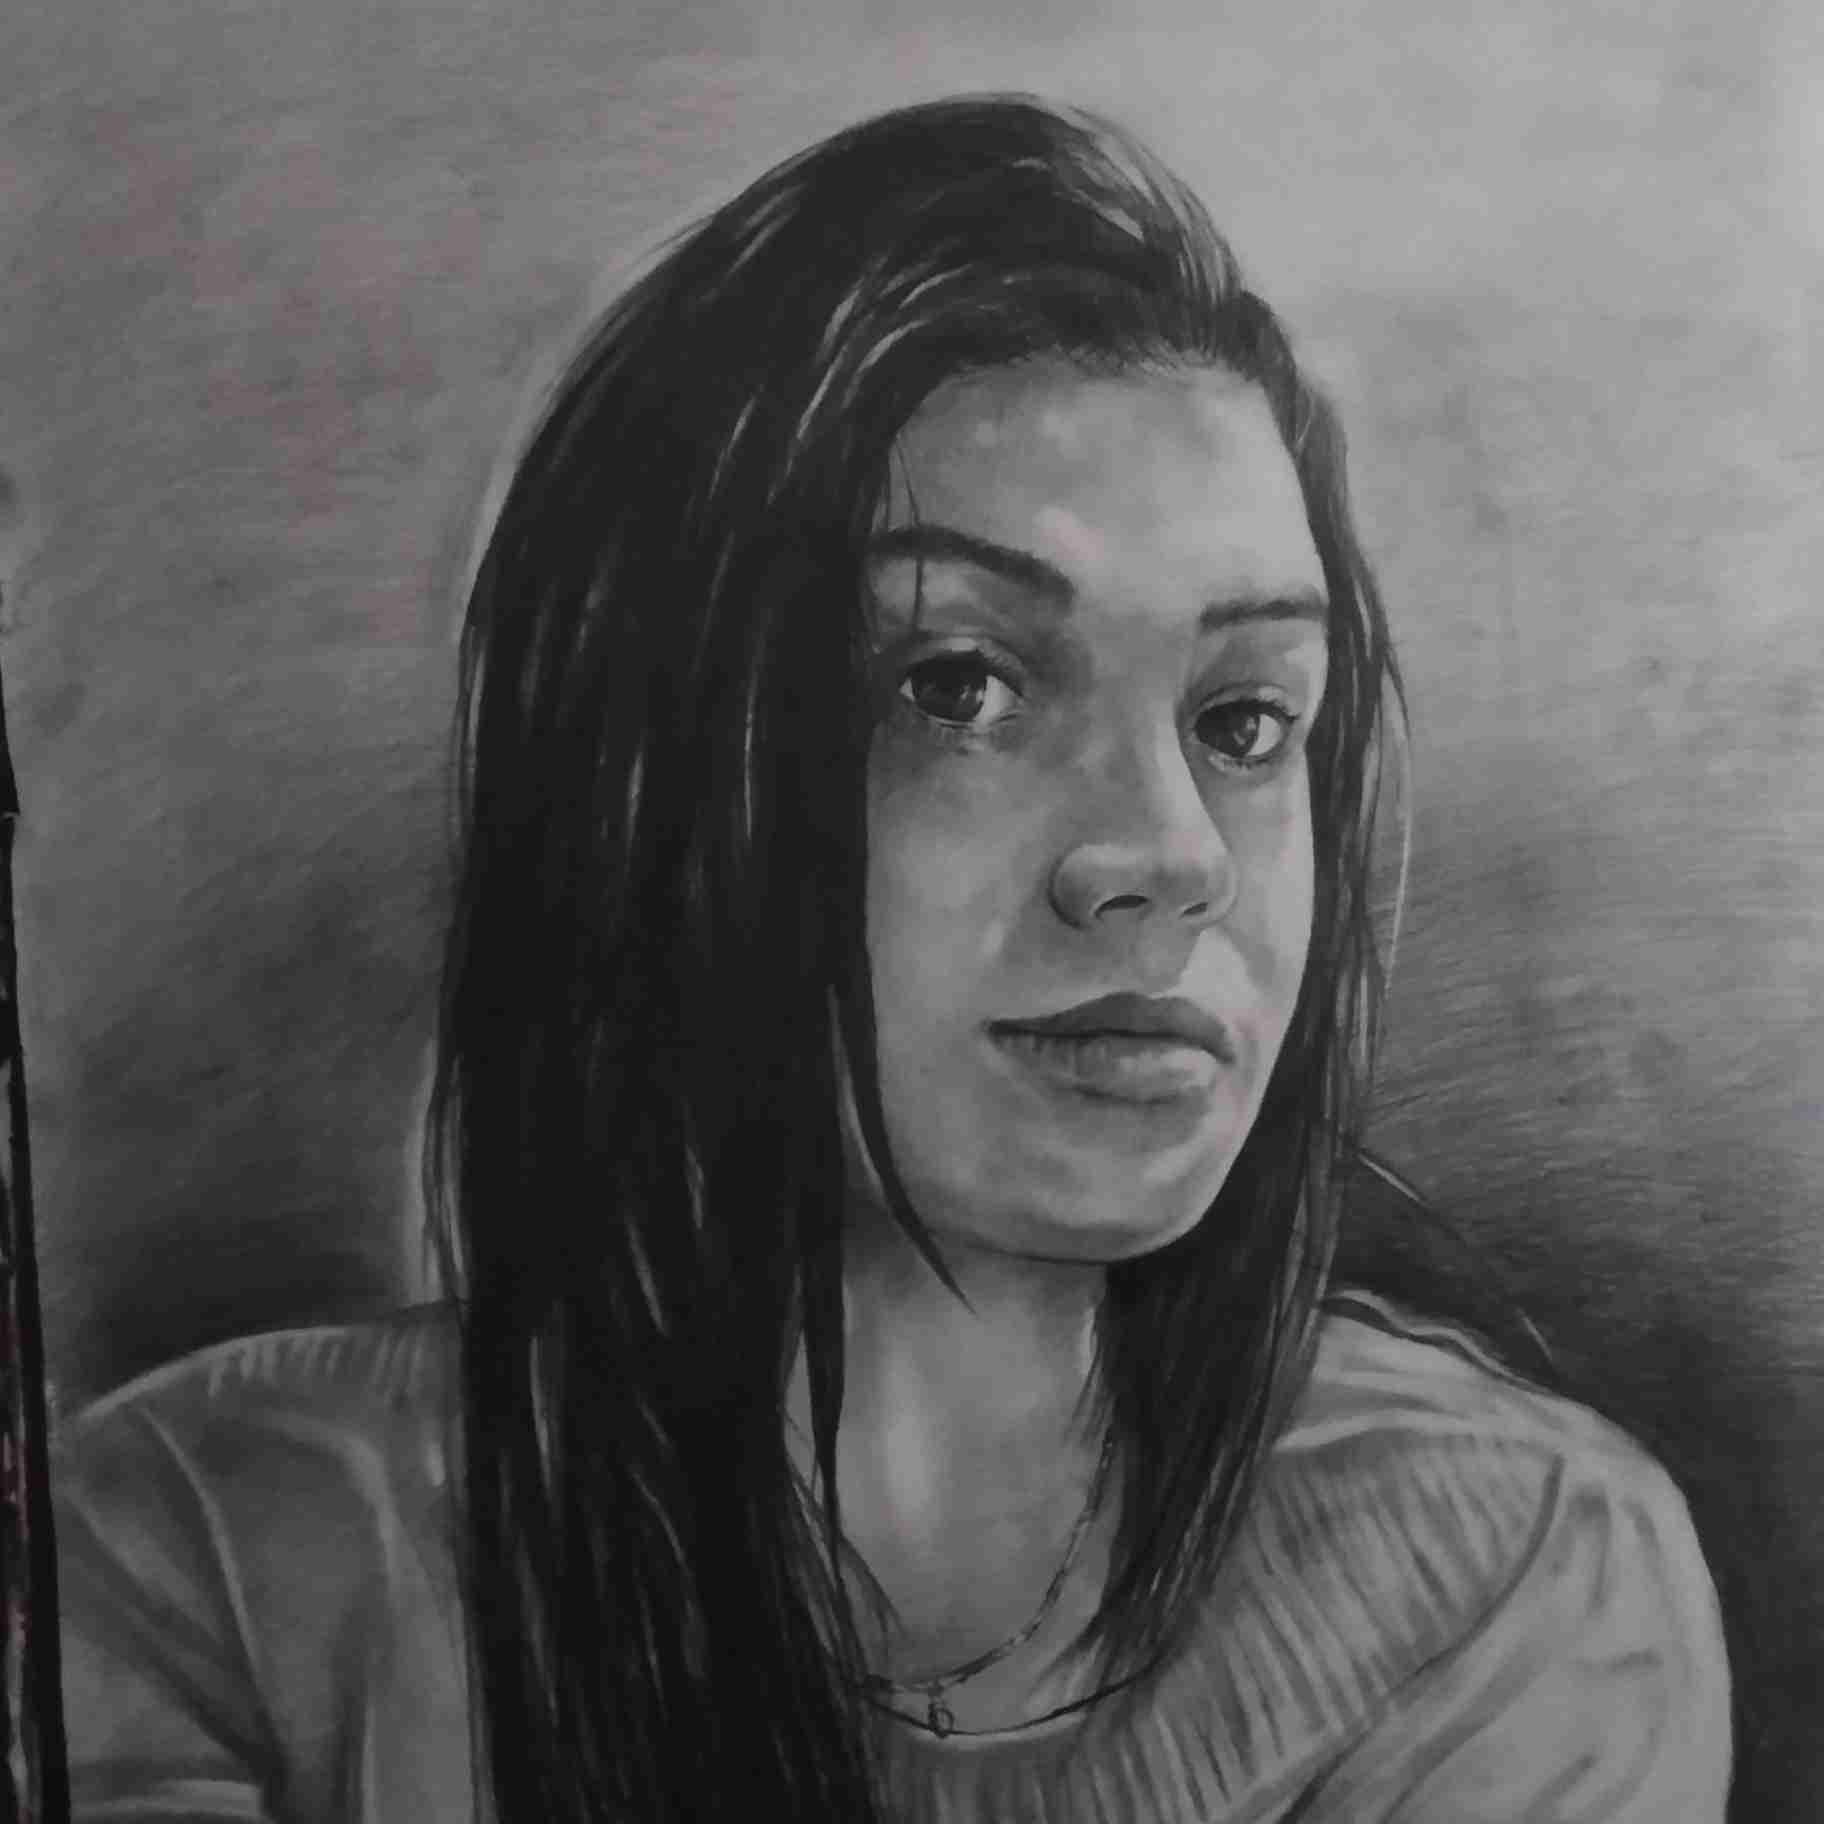 Obra: Retrato de mi esposa